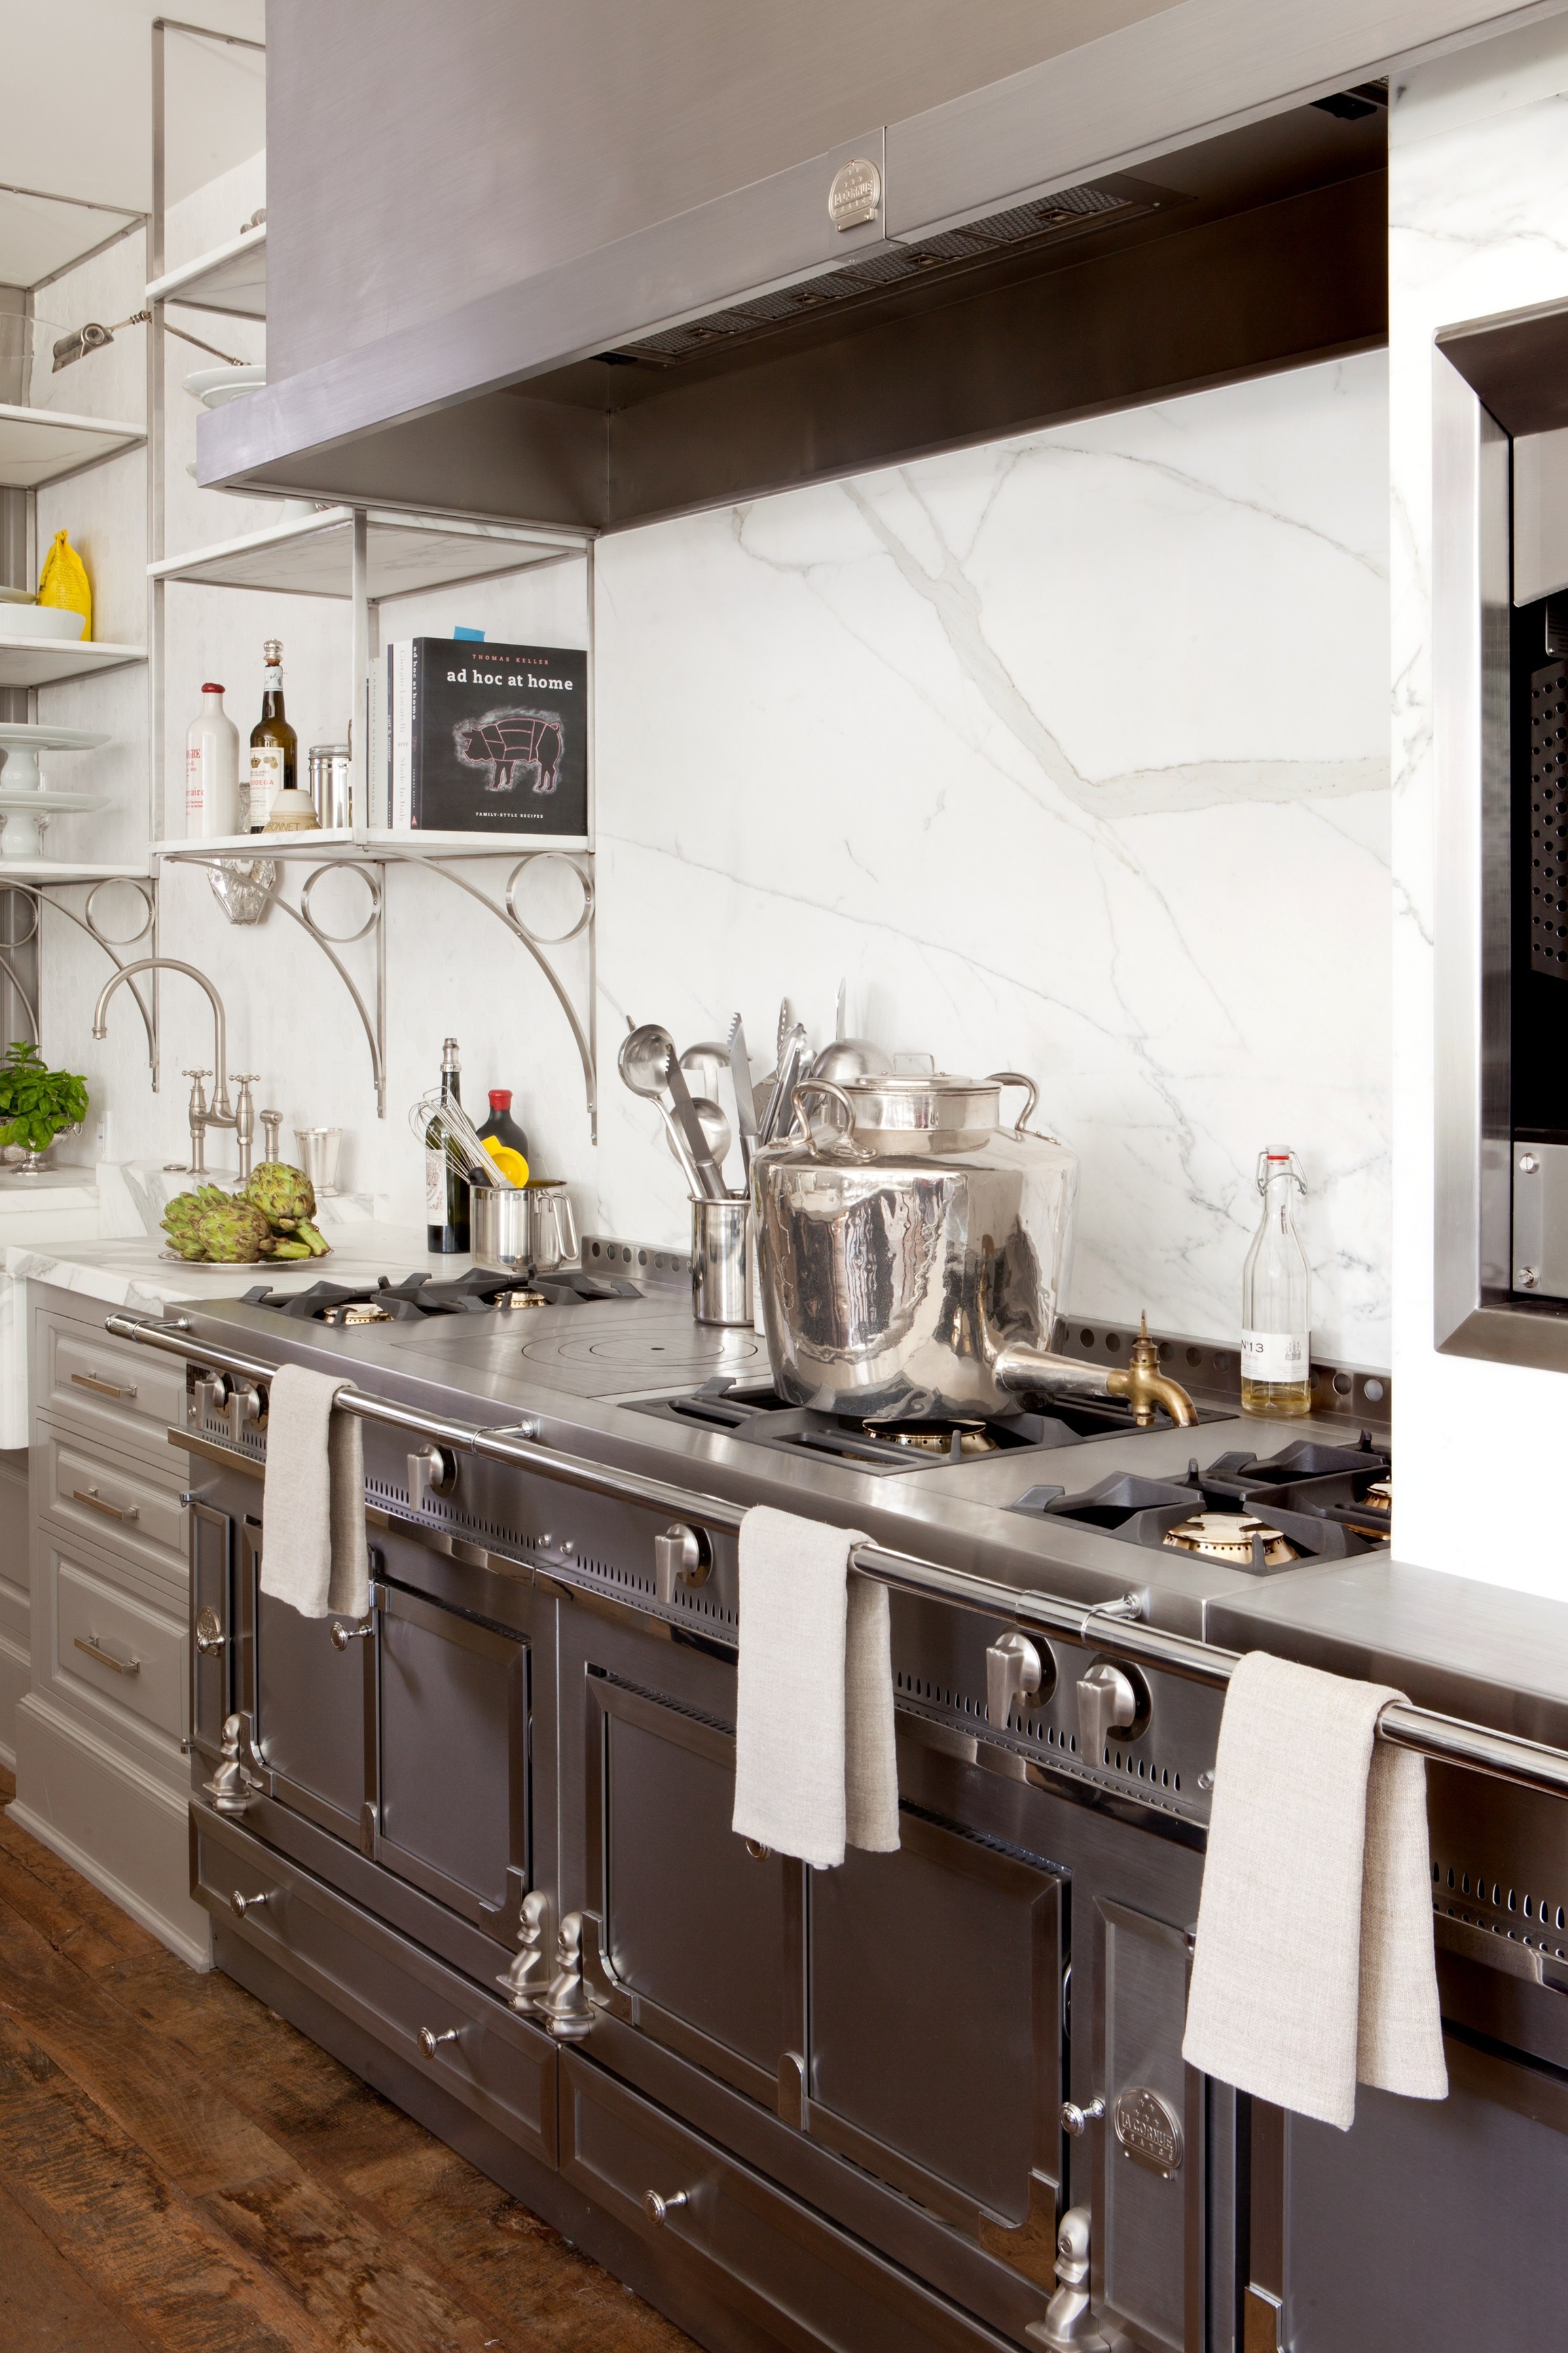 cuisini re en acier inoxydable ch teau 165 by la cornue. Black Bedroom Furniture Sets. Home Design Ideas